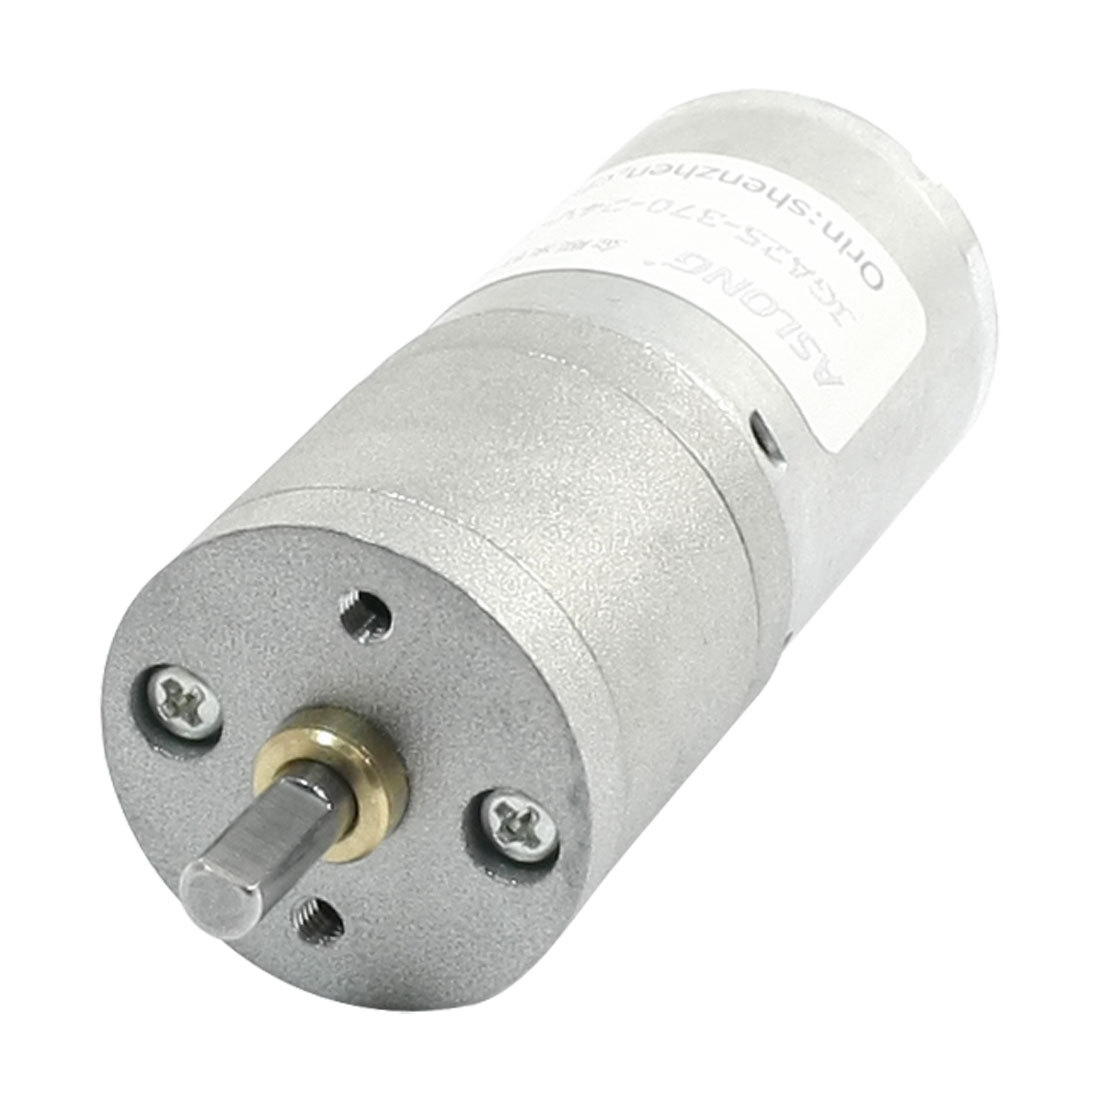 GA25-370 DC 24V 7.5r/min 4mm Shaft Cylindrical Speed Reduce Gear Motor